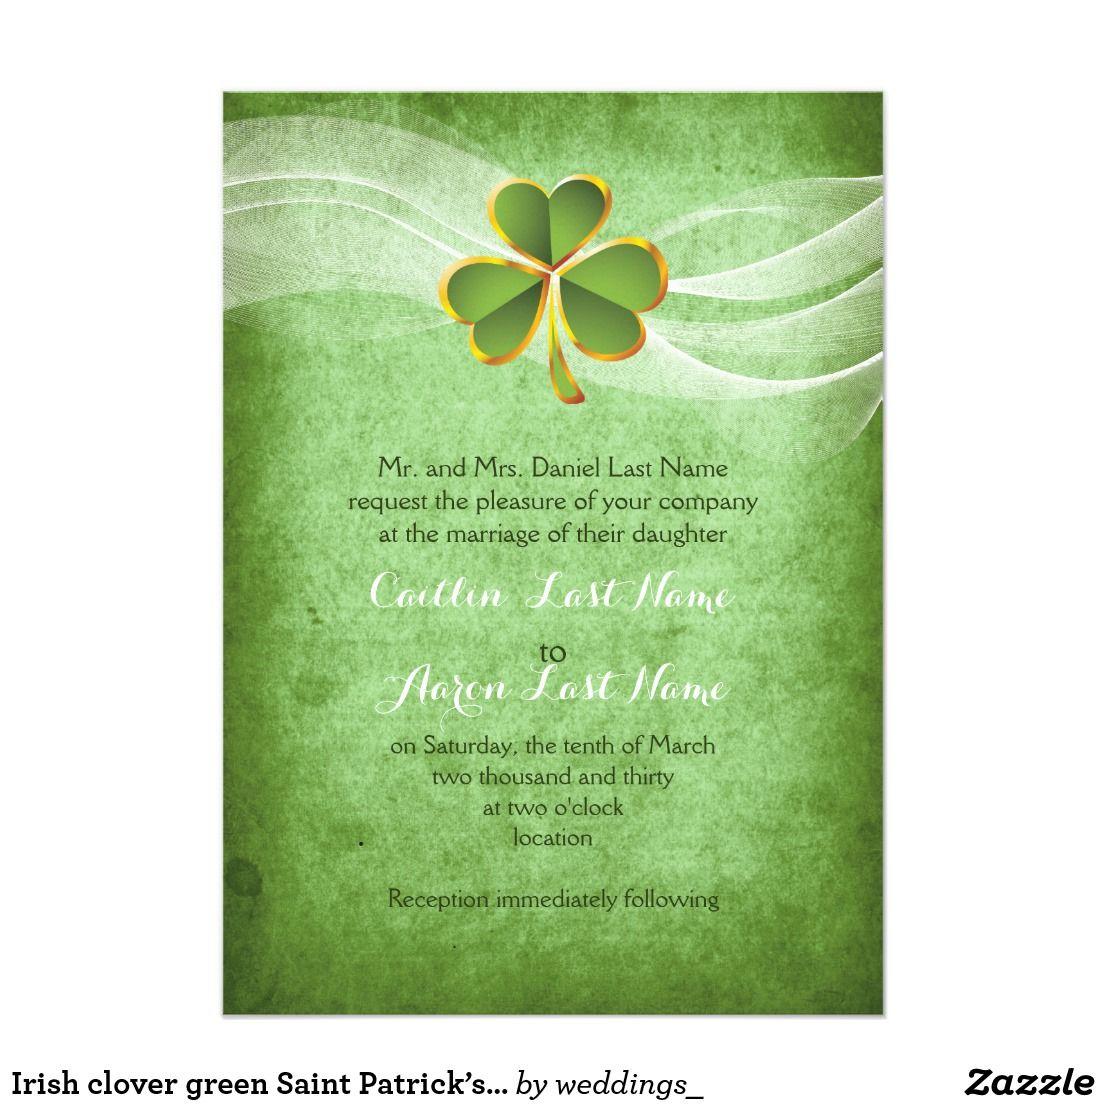 Irish Clover Green Saint Patrick's Day Wedding Card And Veil Invitation Featuring A Shamrock Leaf With: Invitations Wedding Fun Irish At Websimilar.org